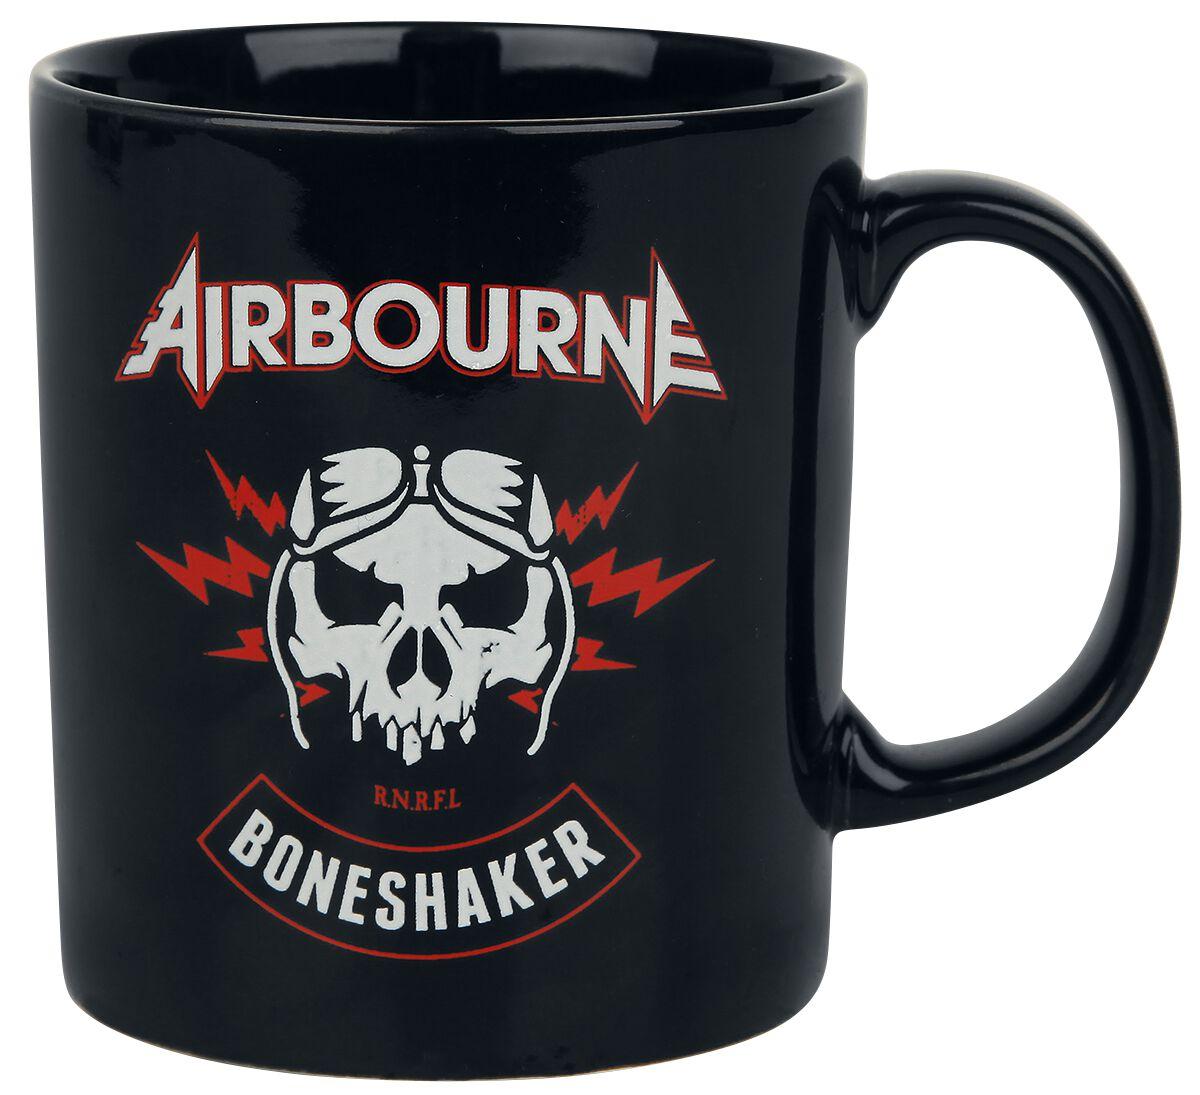 Image of Airbourne Boneshaker Tasse Tasse schwarz